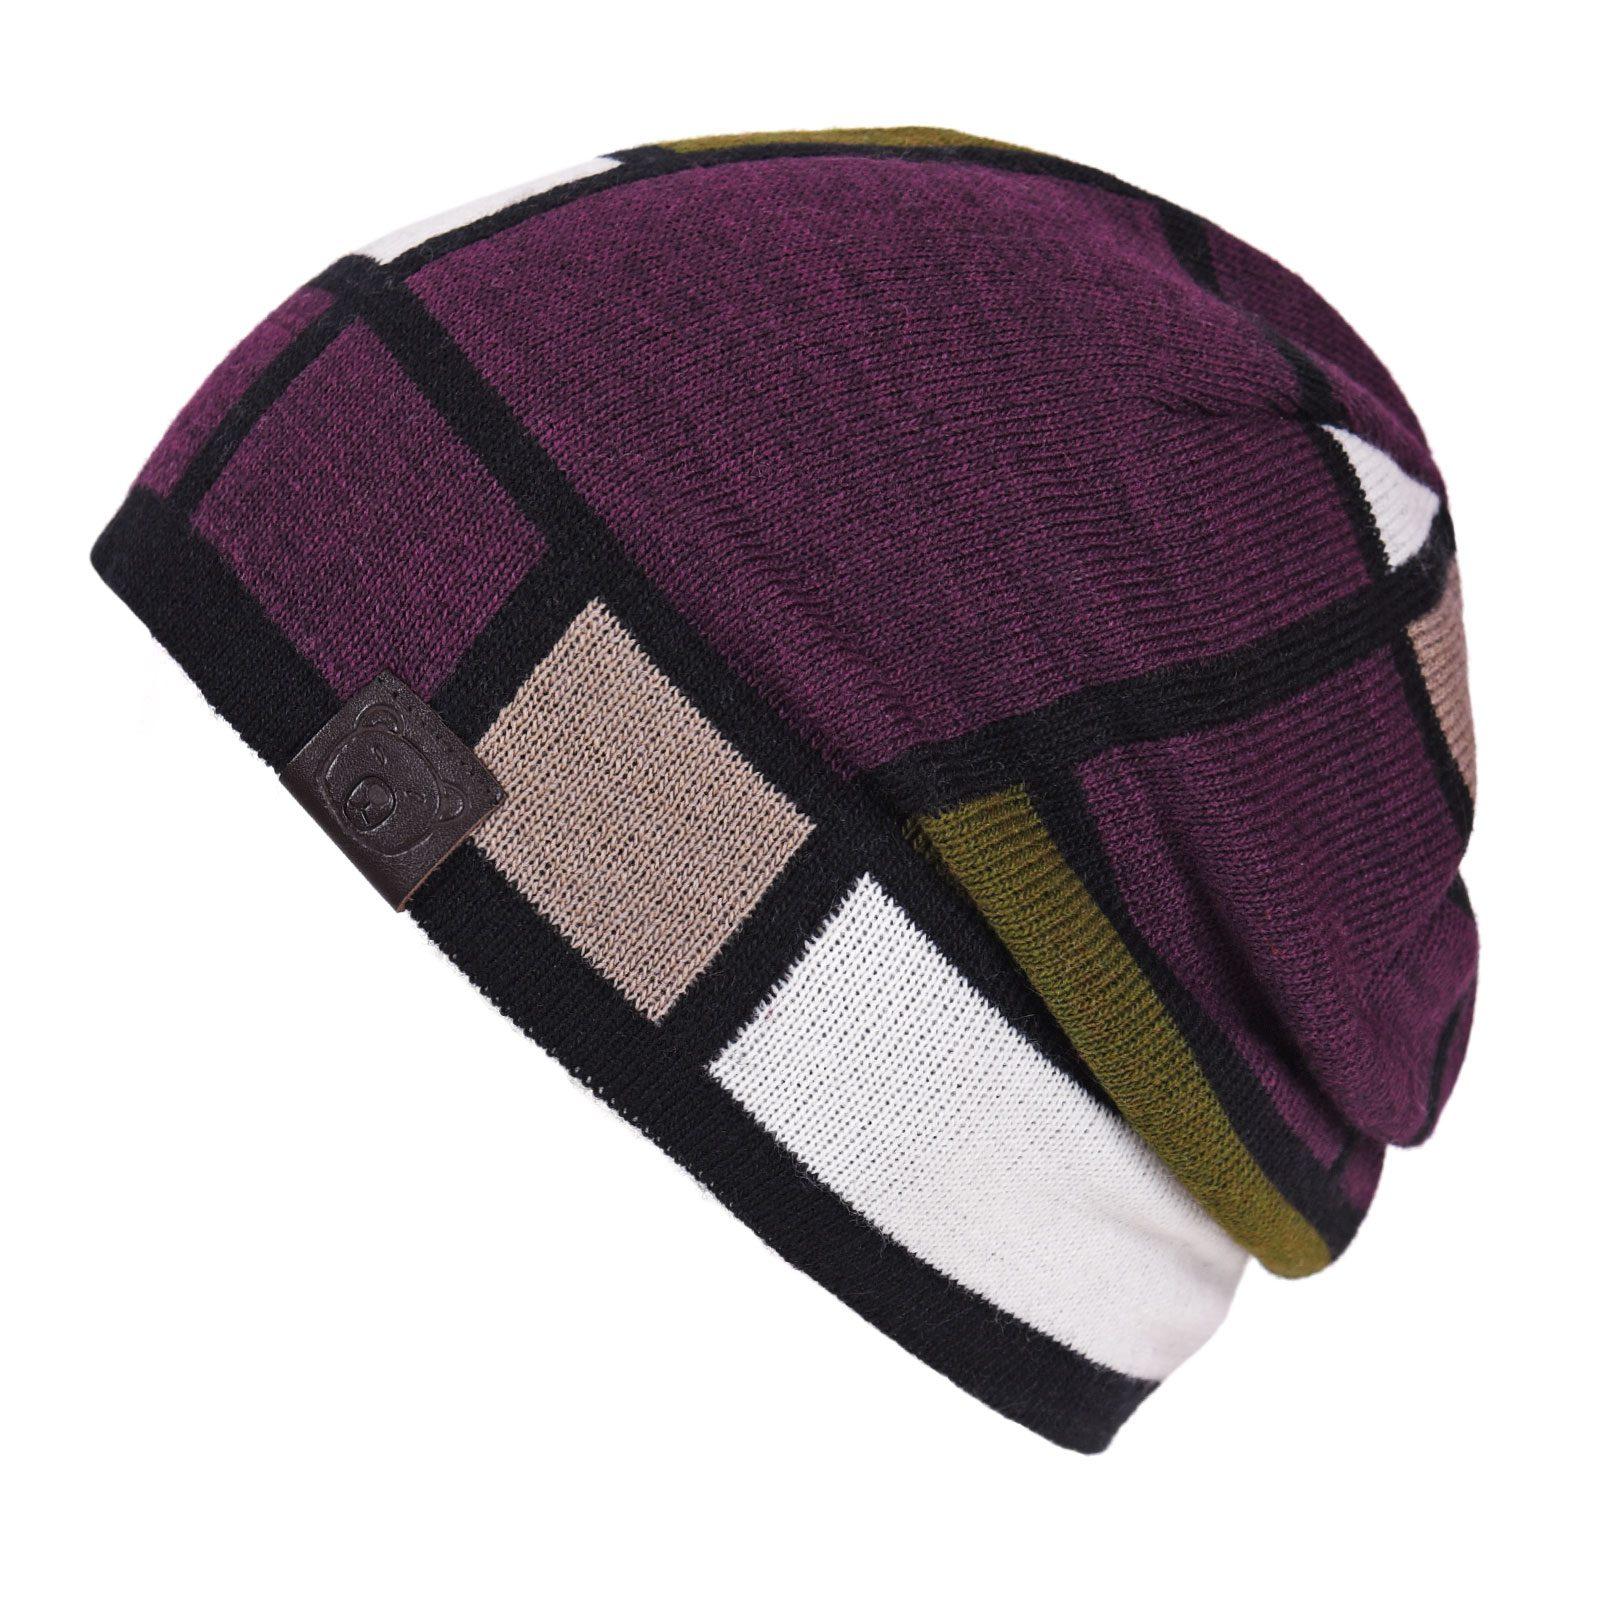 http://lookbook.allee-du-foulard.fr/wp-content/uploads/2018/11/CP-01038-GH16-bonnet-patchwork-violet-mokalunga-1600x1600.jpg